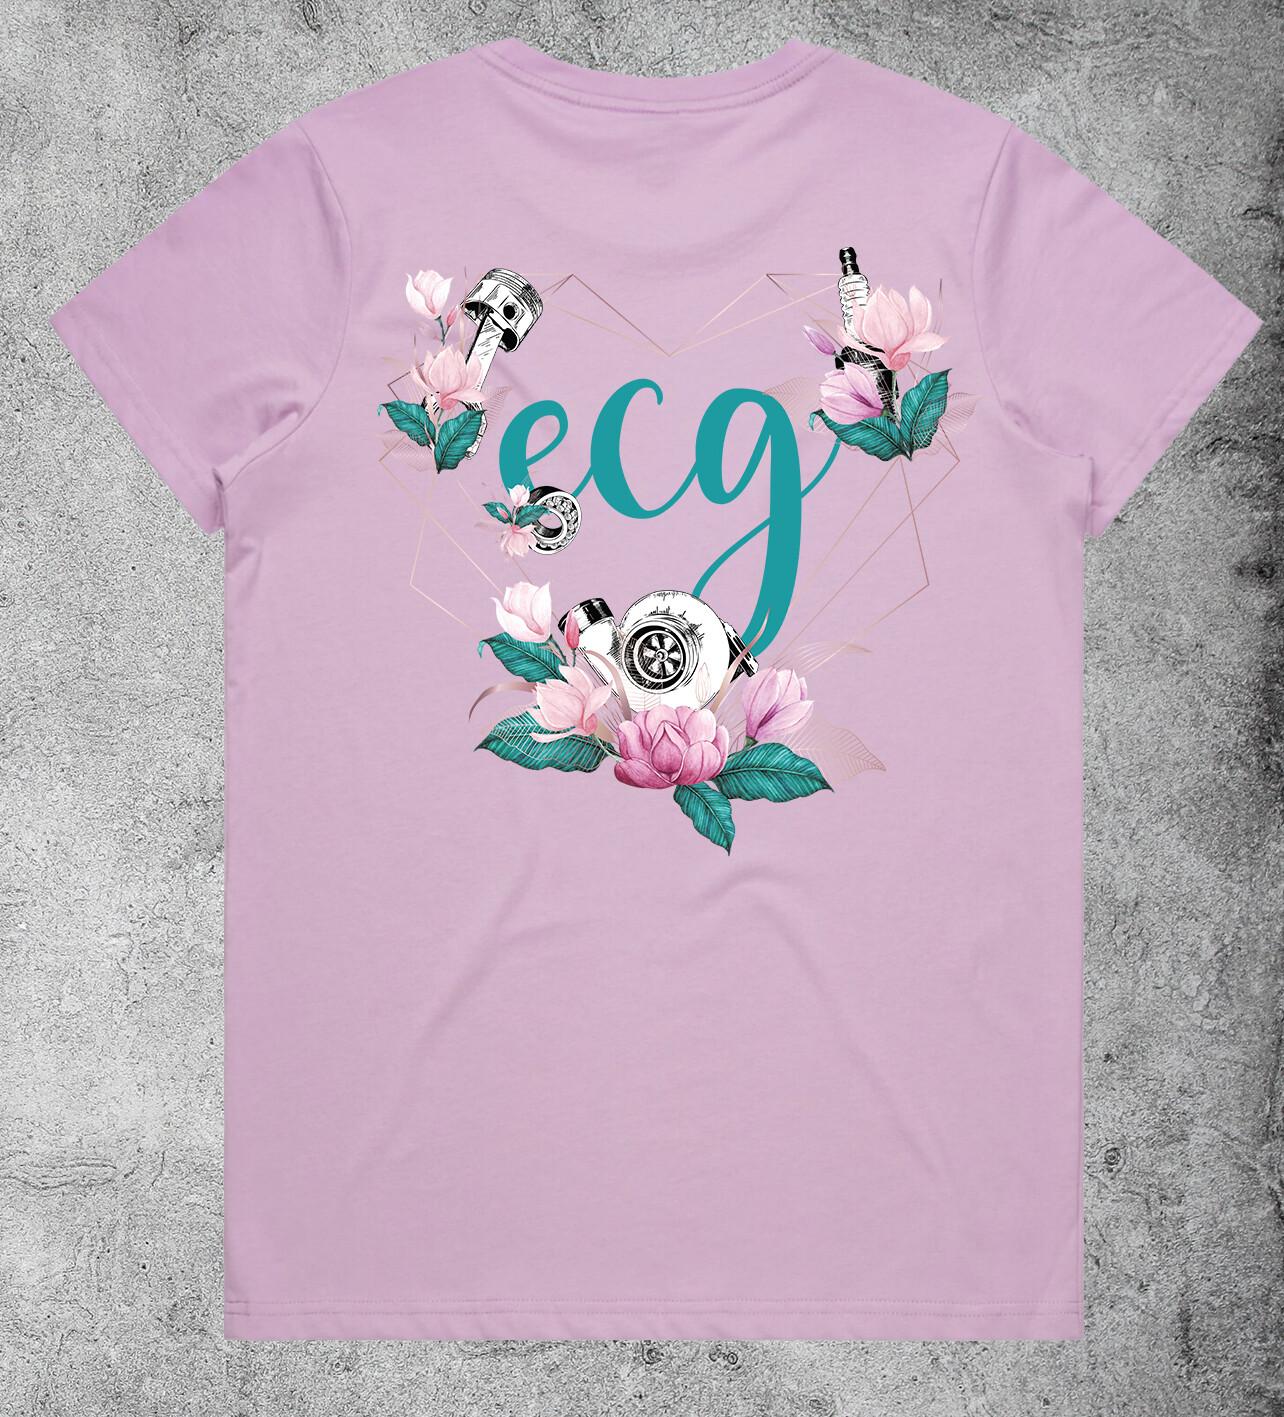 ECG Heart Logo T-shirt - Lavender